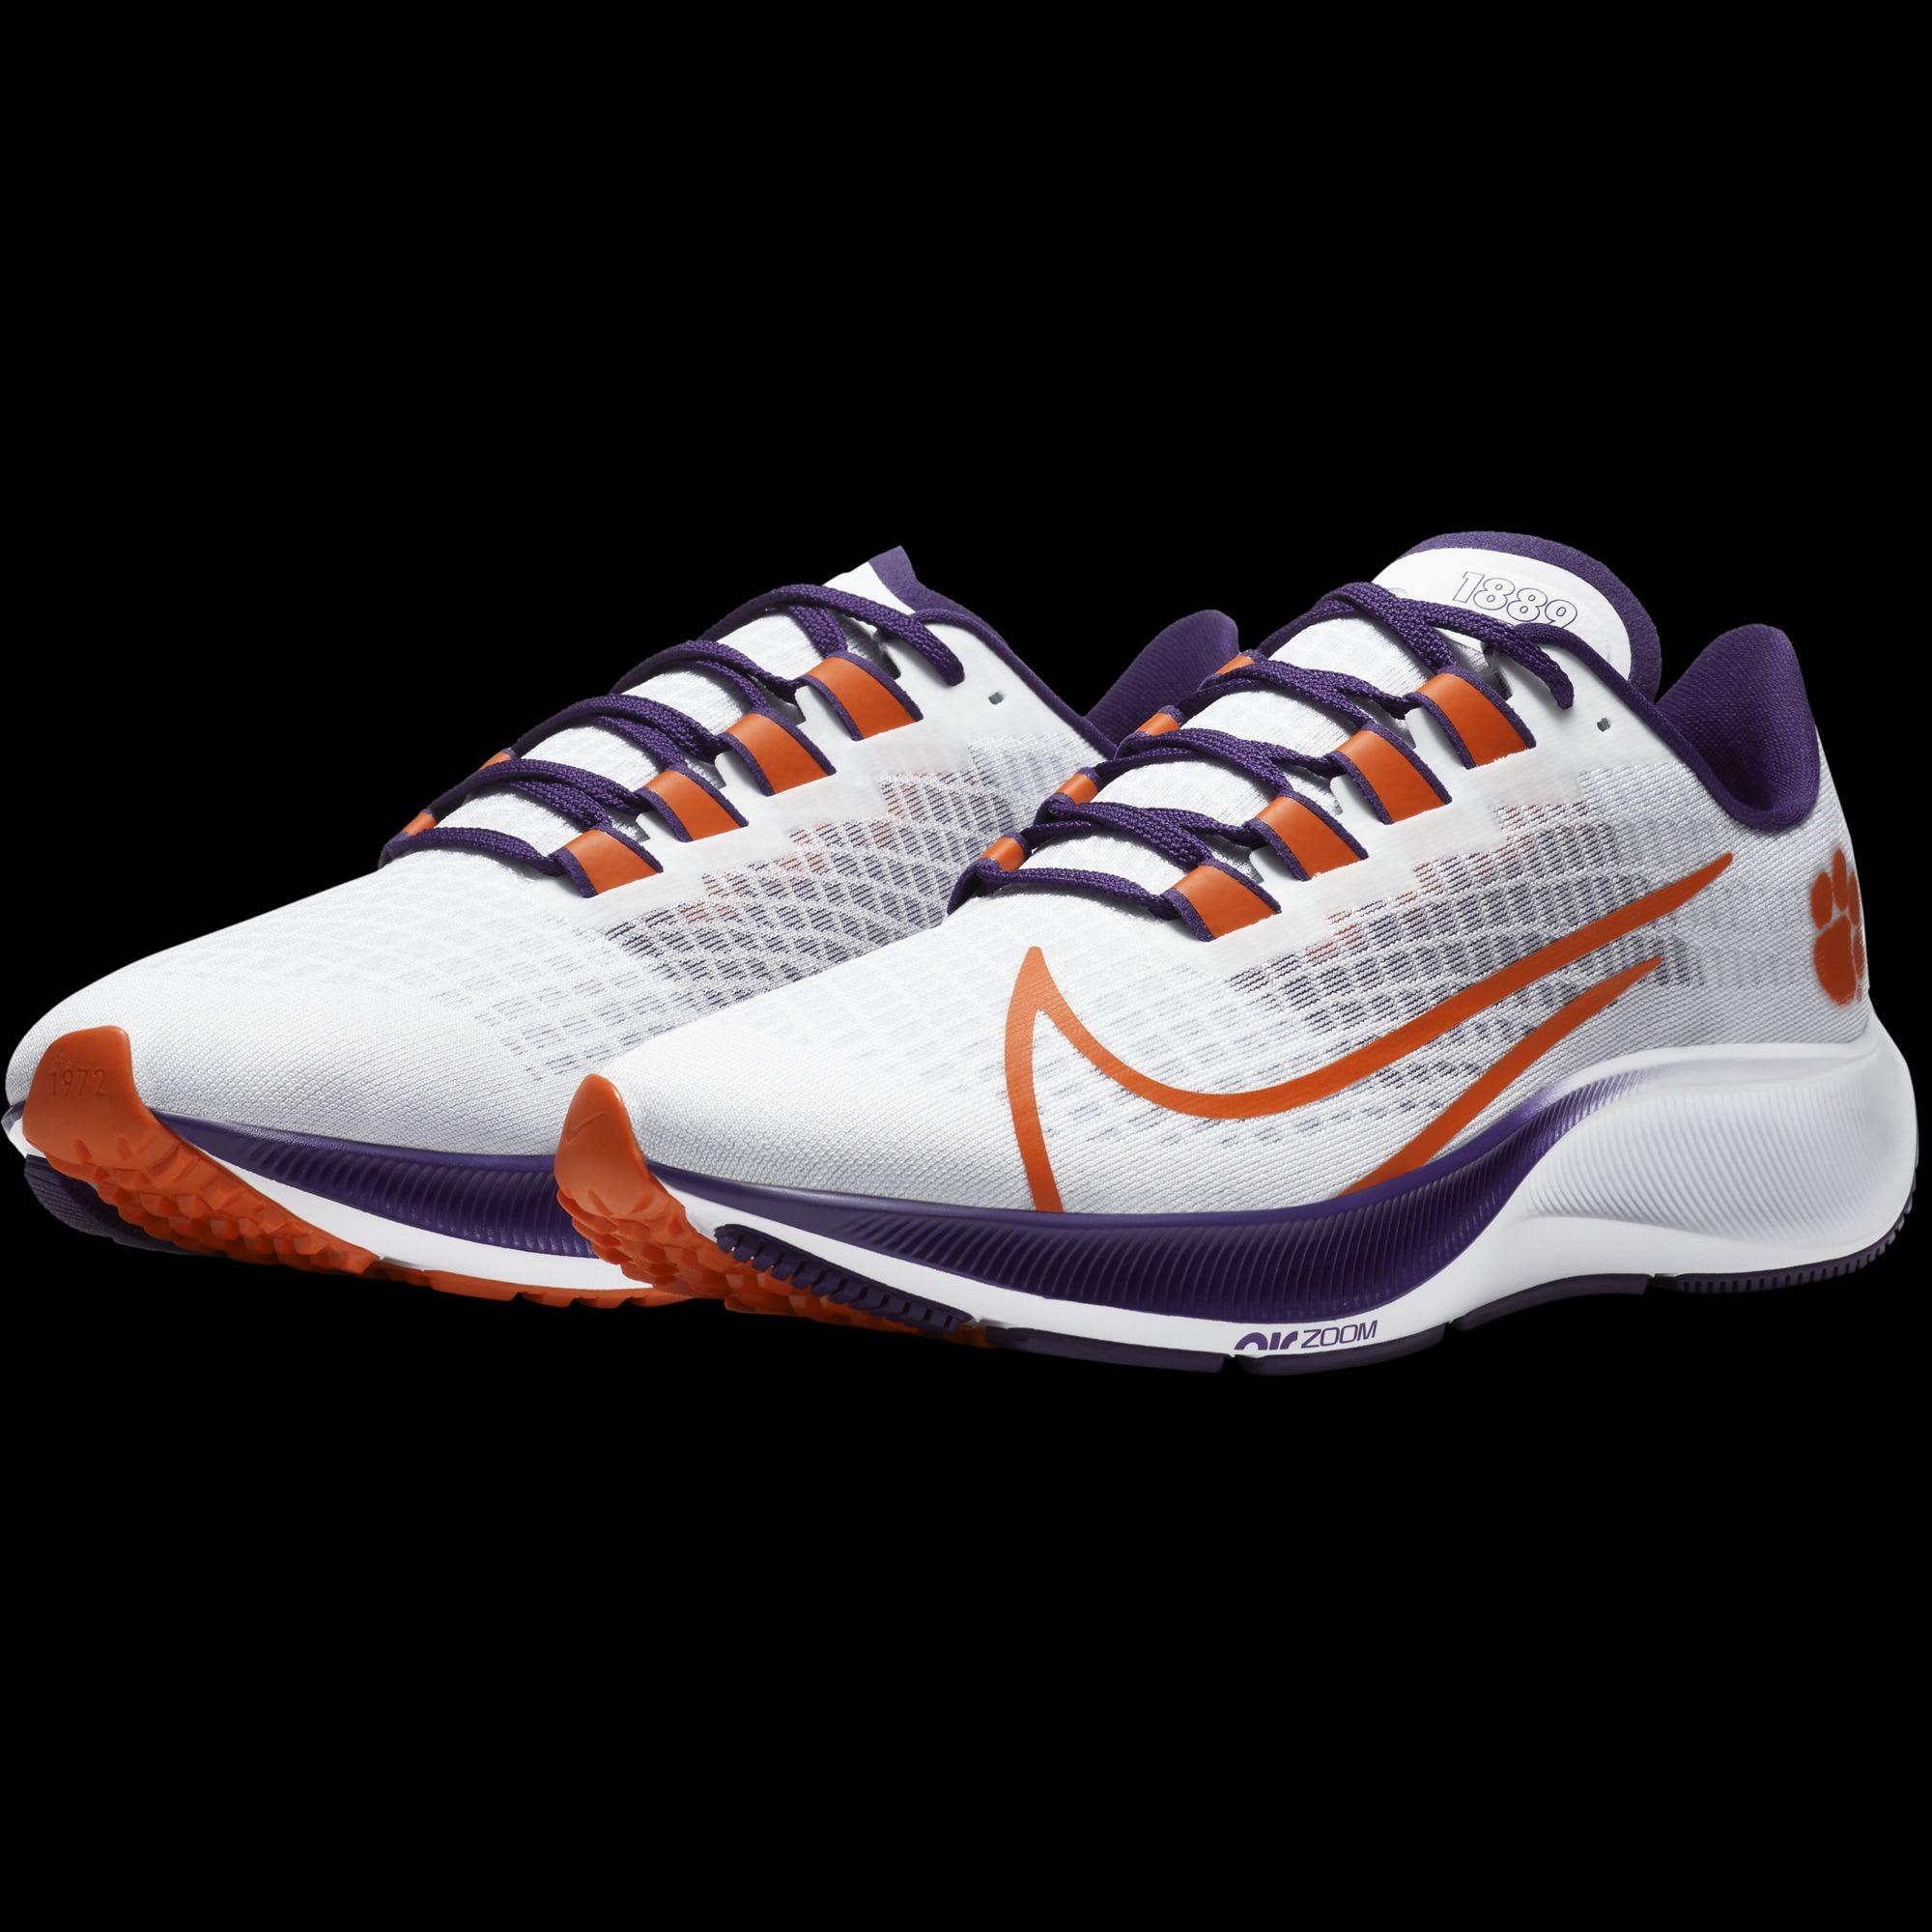 The Nike Air Zoom Pegasus 37 Clemson